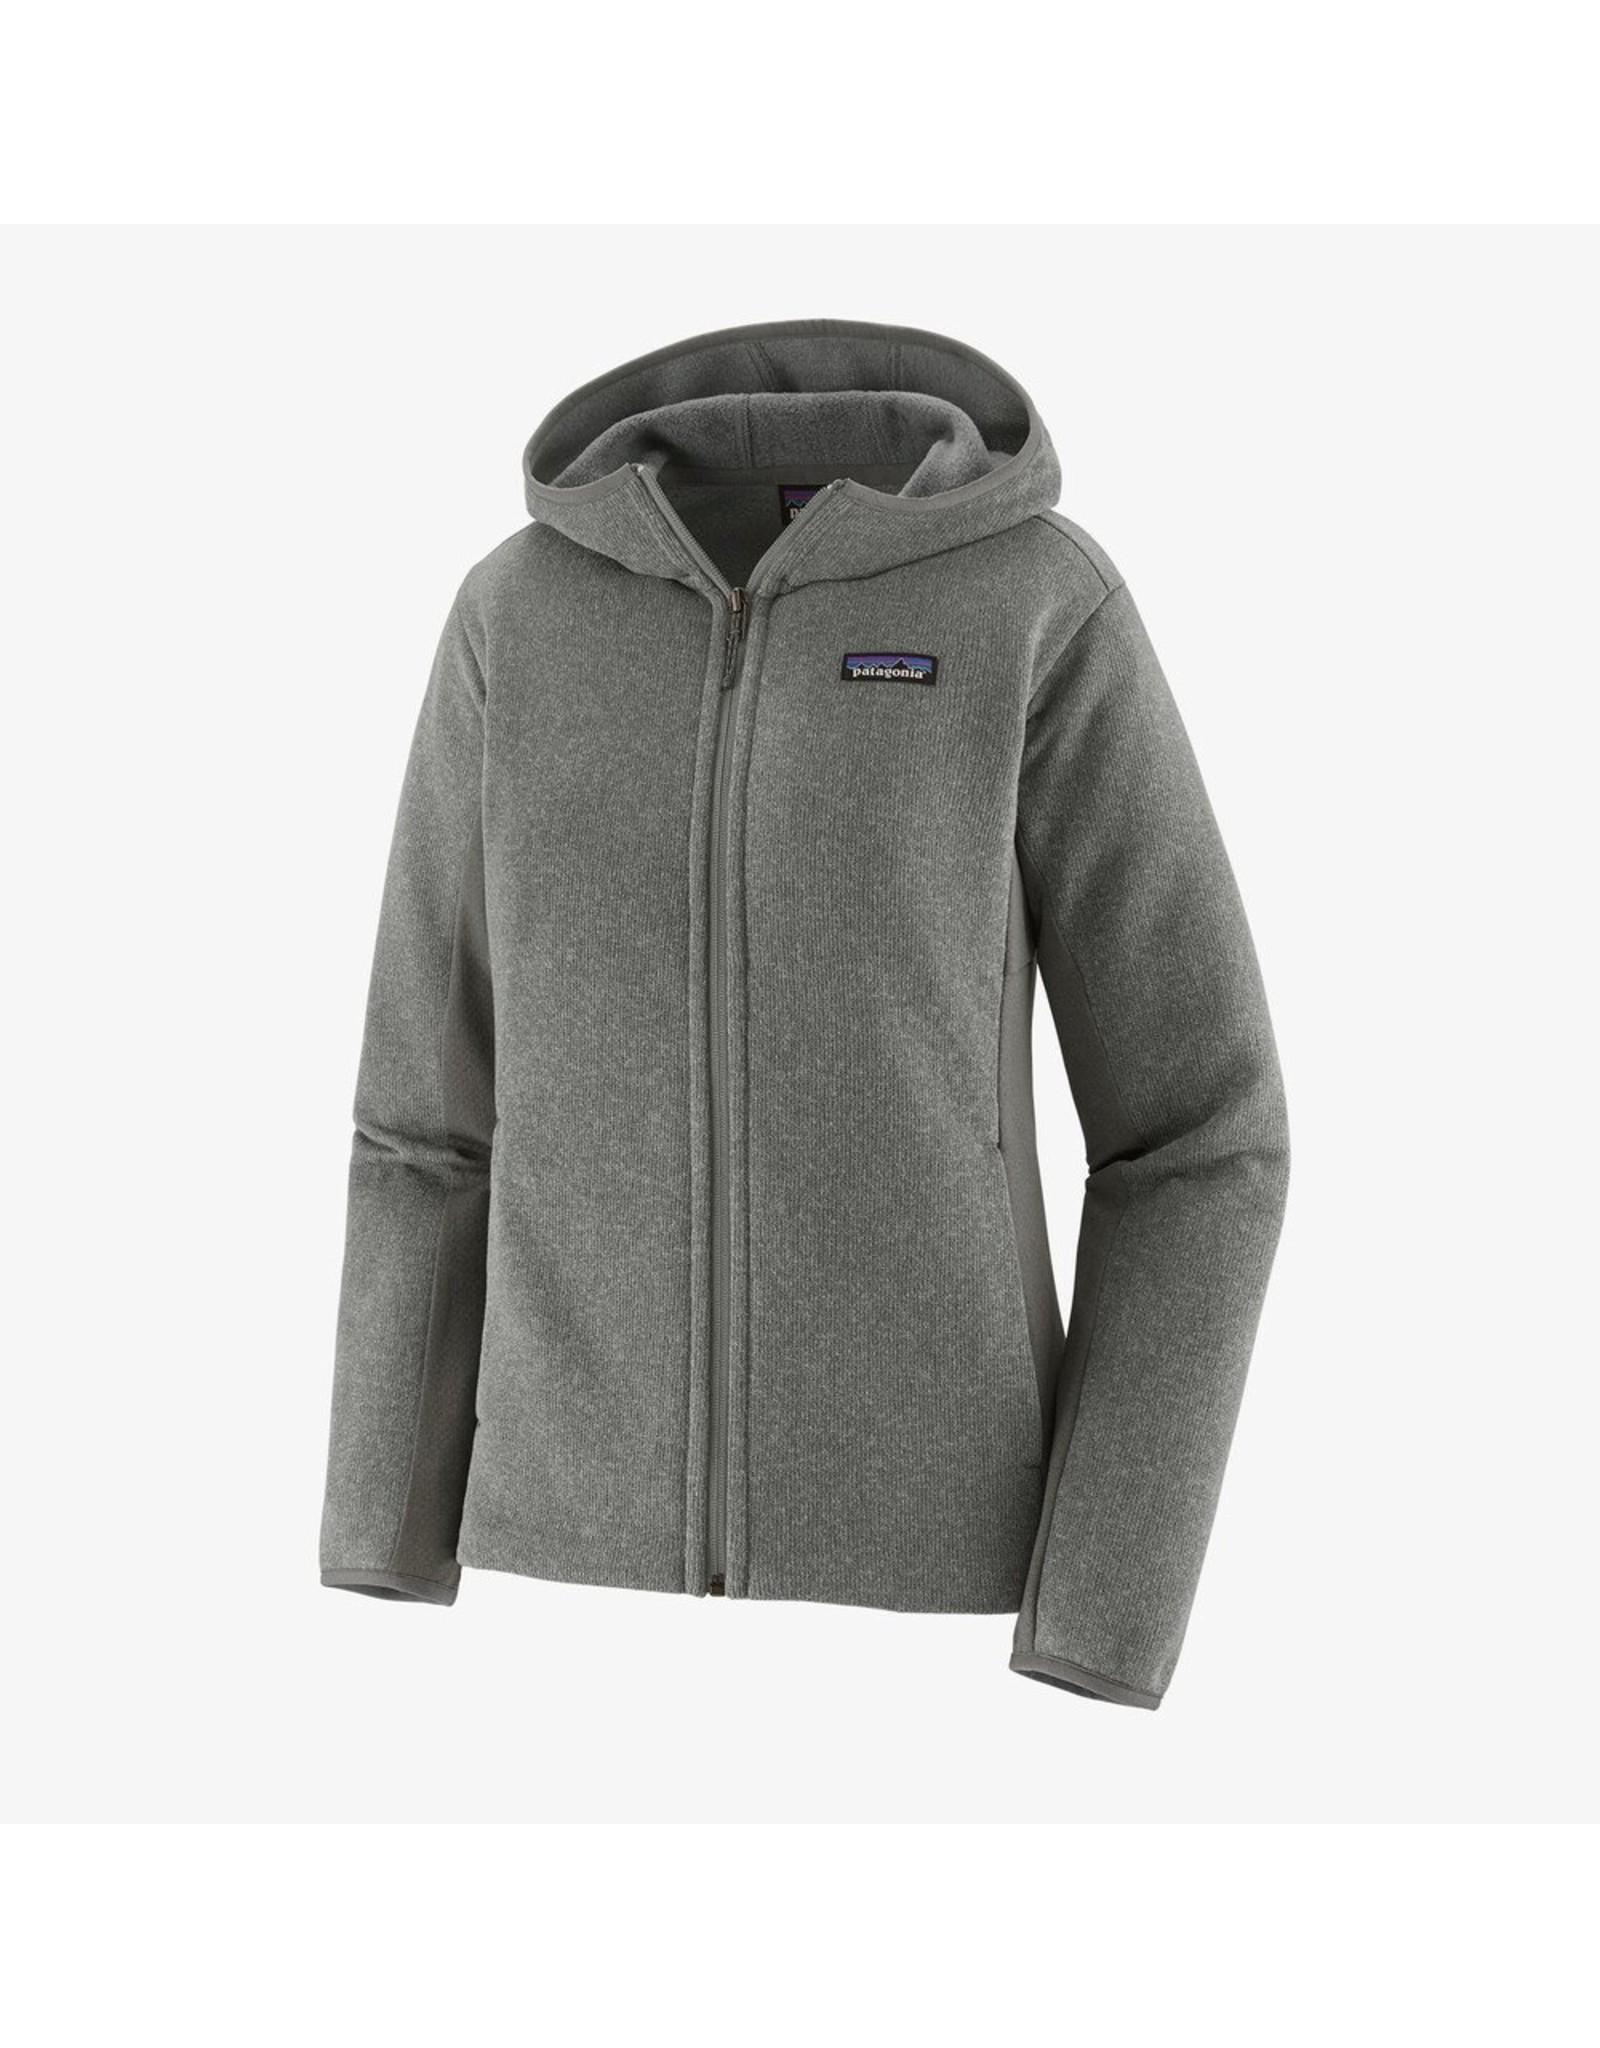 Patagonia Patagonia - W's Lightweight Better Sweater Hoody